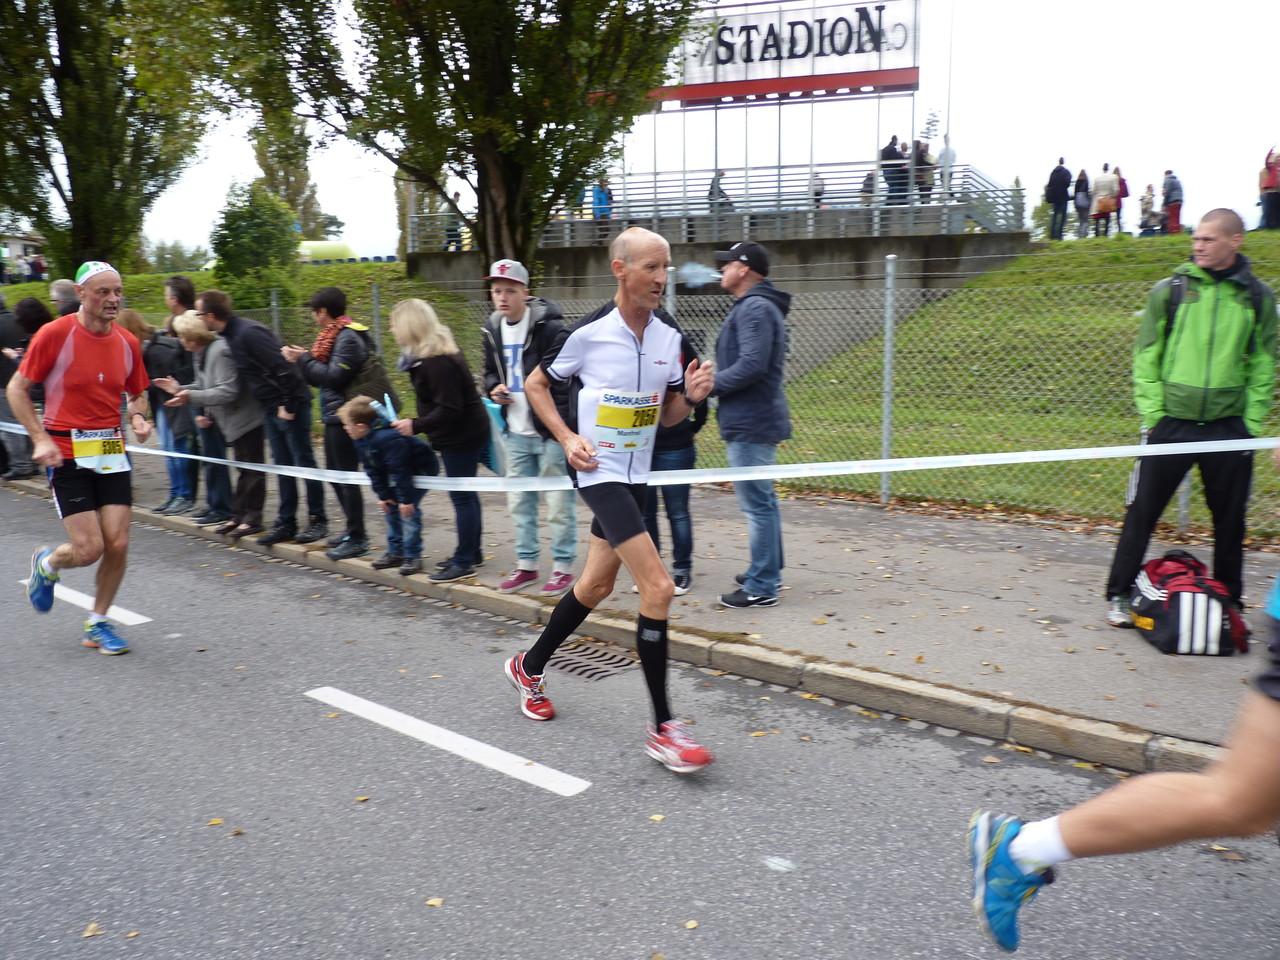 Manfred kurz vor dem Ziel - Halbmarathon Zeit: 1:37:28